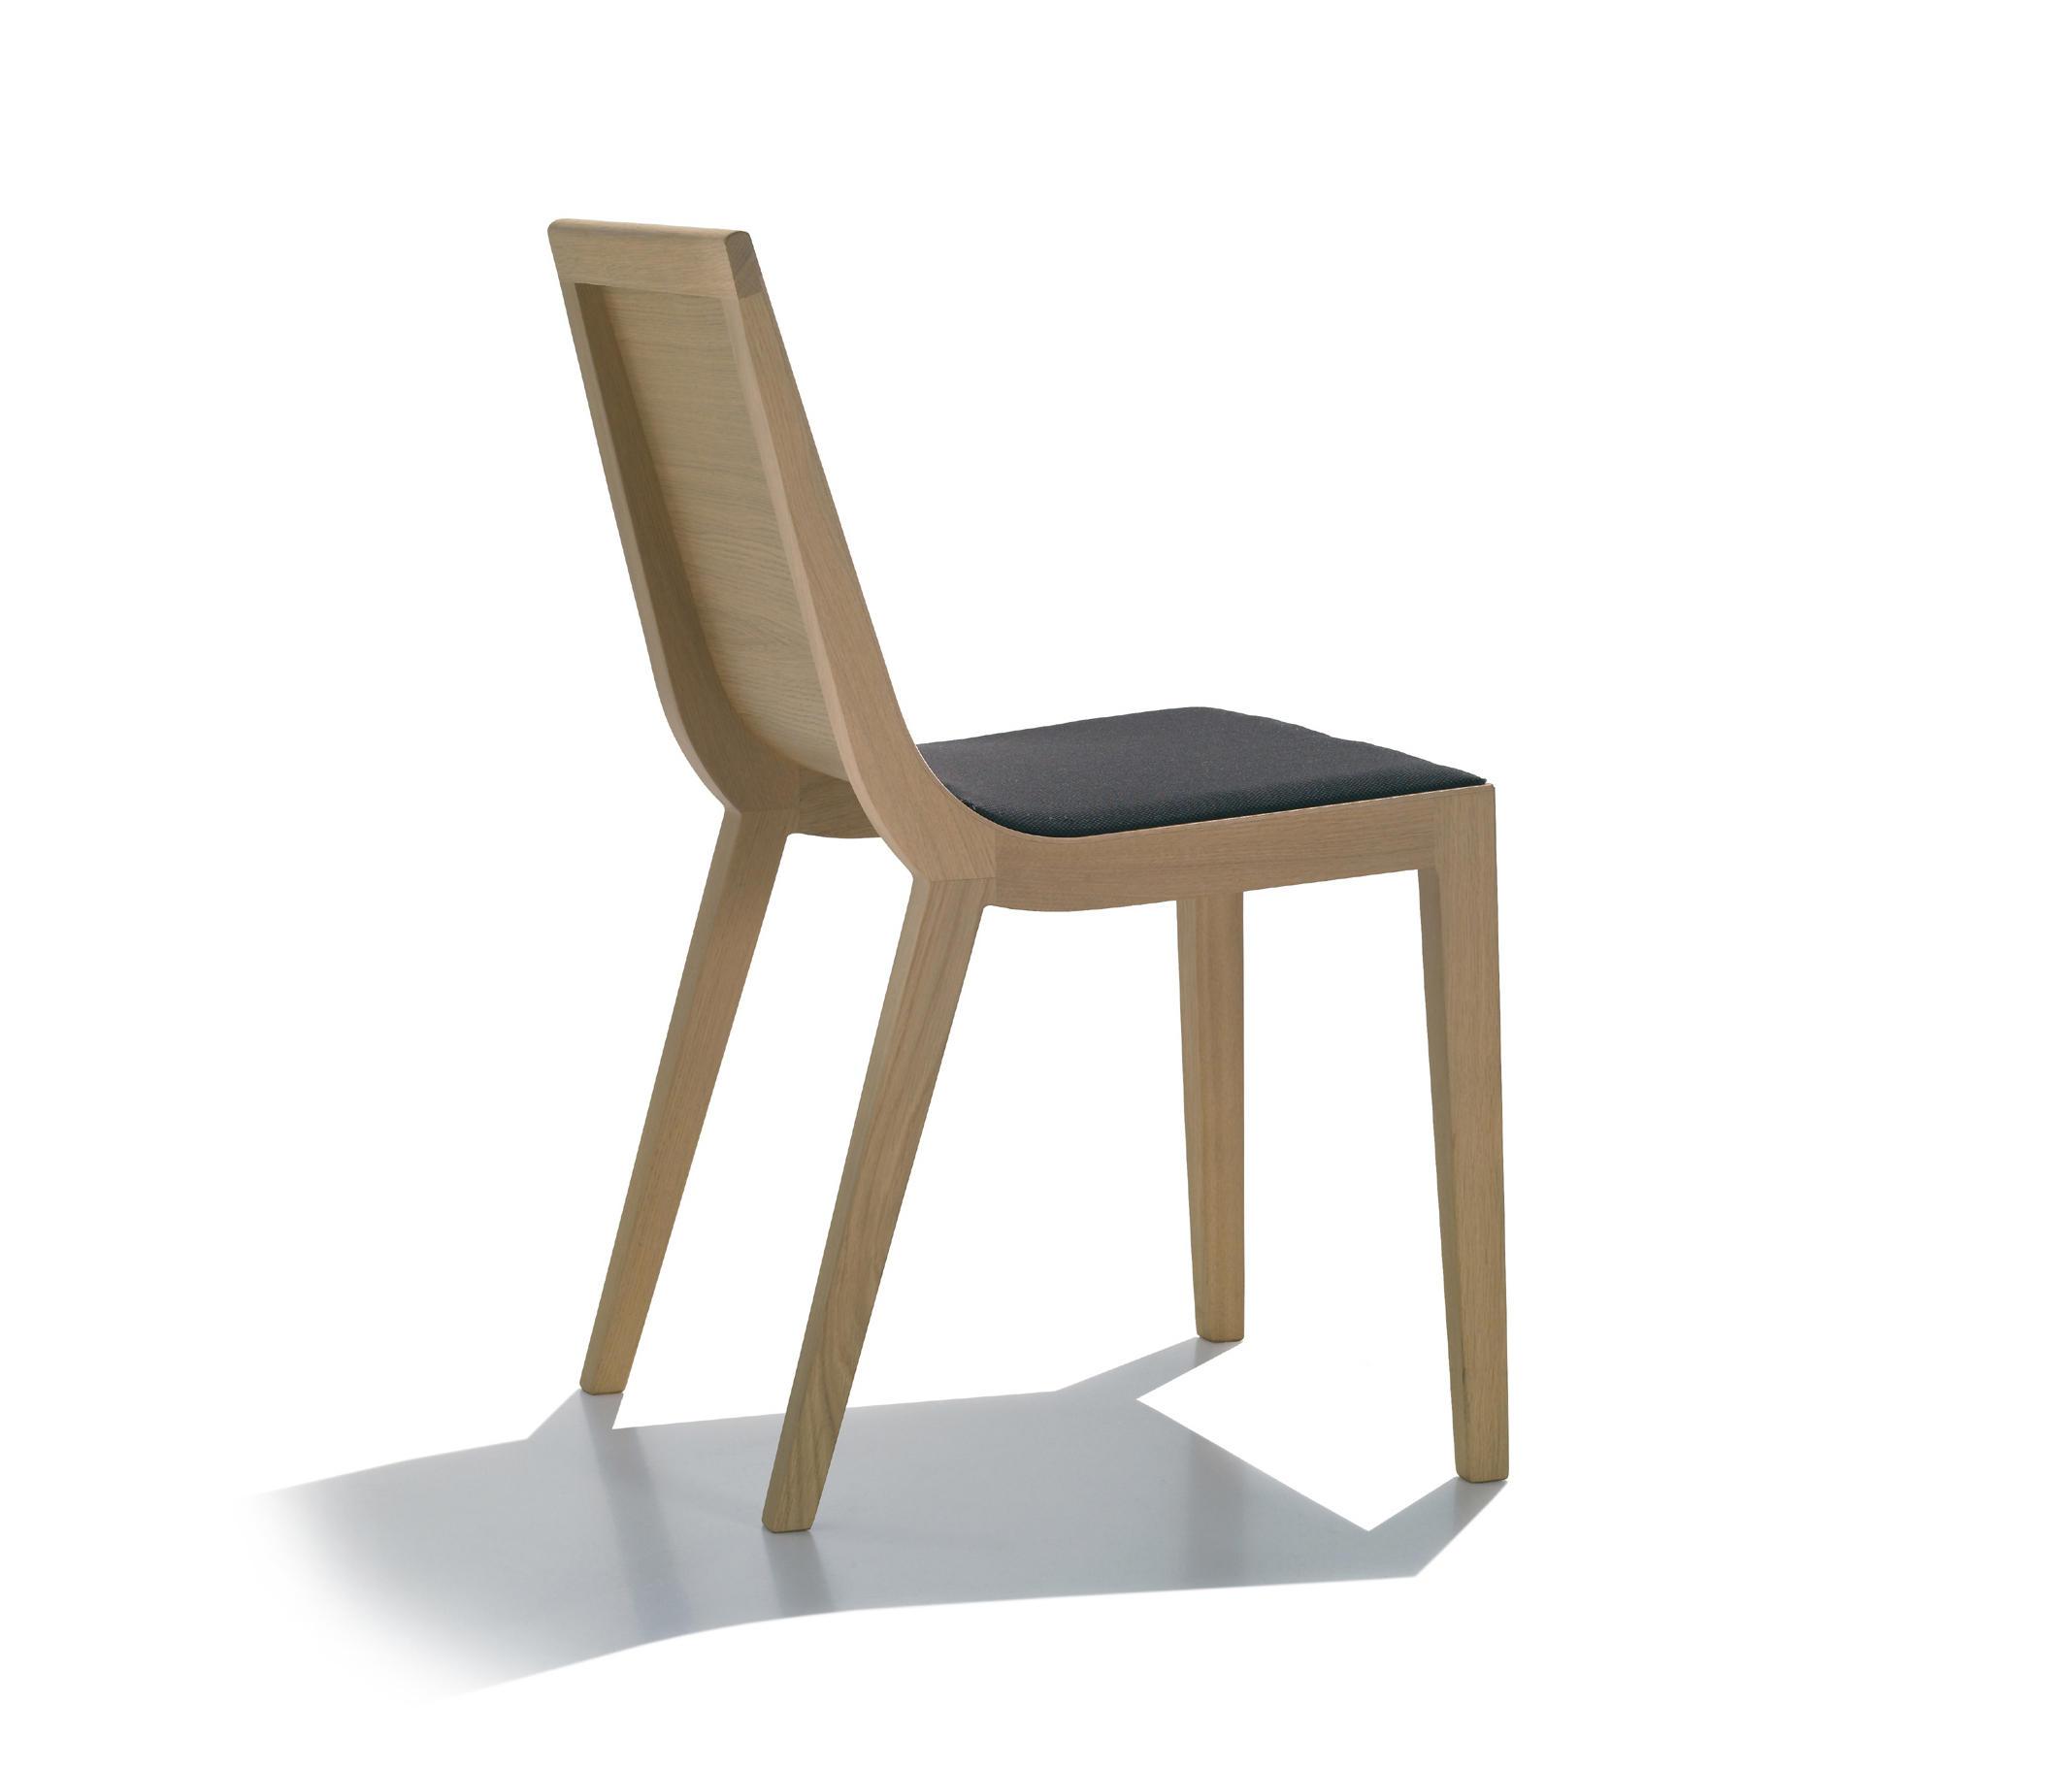 Rdl si 7291 sillas multiusos de andreu world architonic - Andreu world catalogo ...